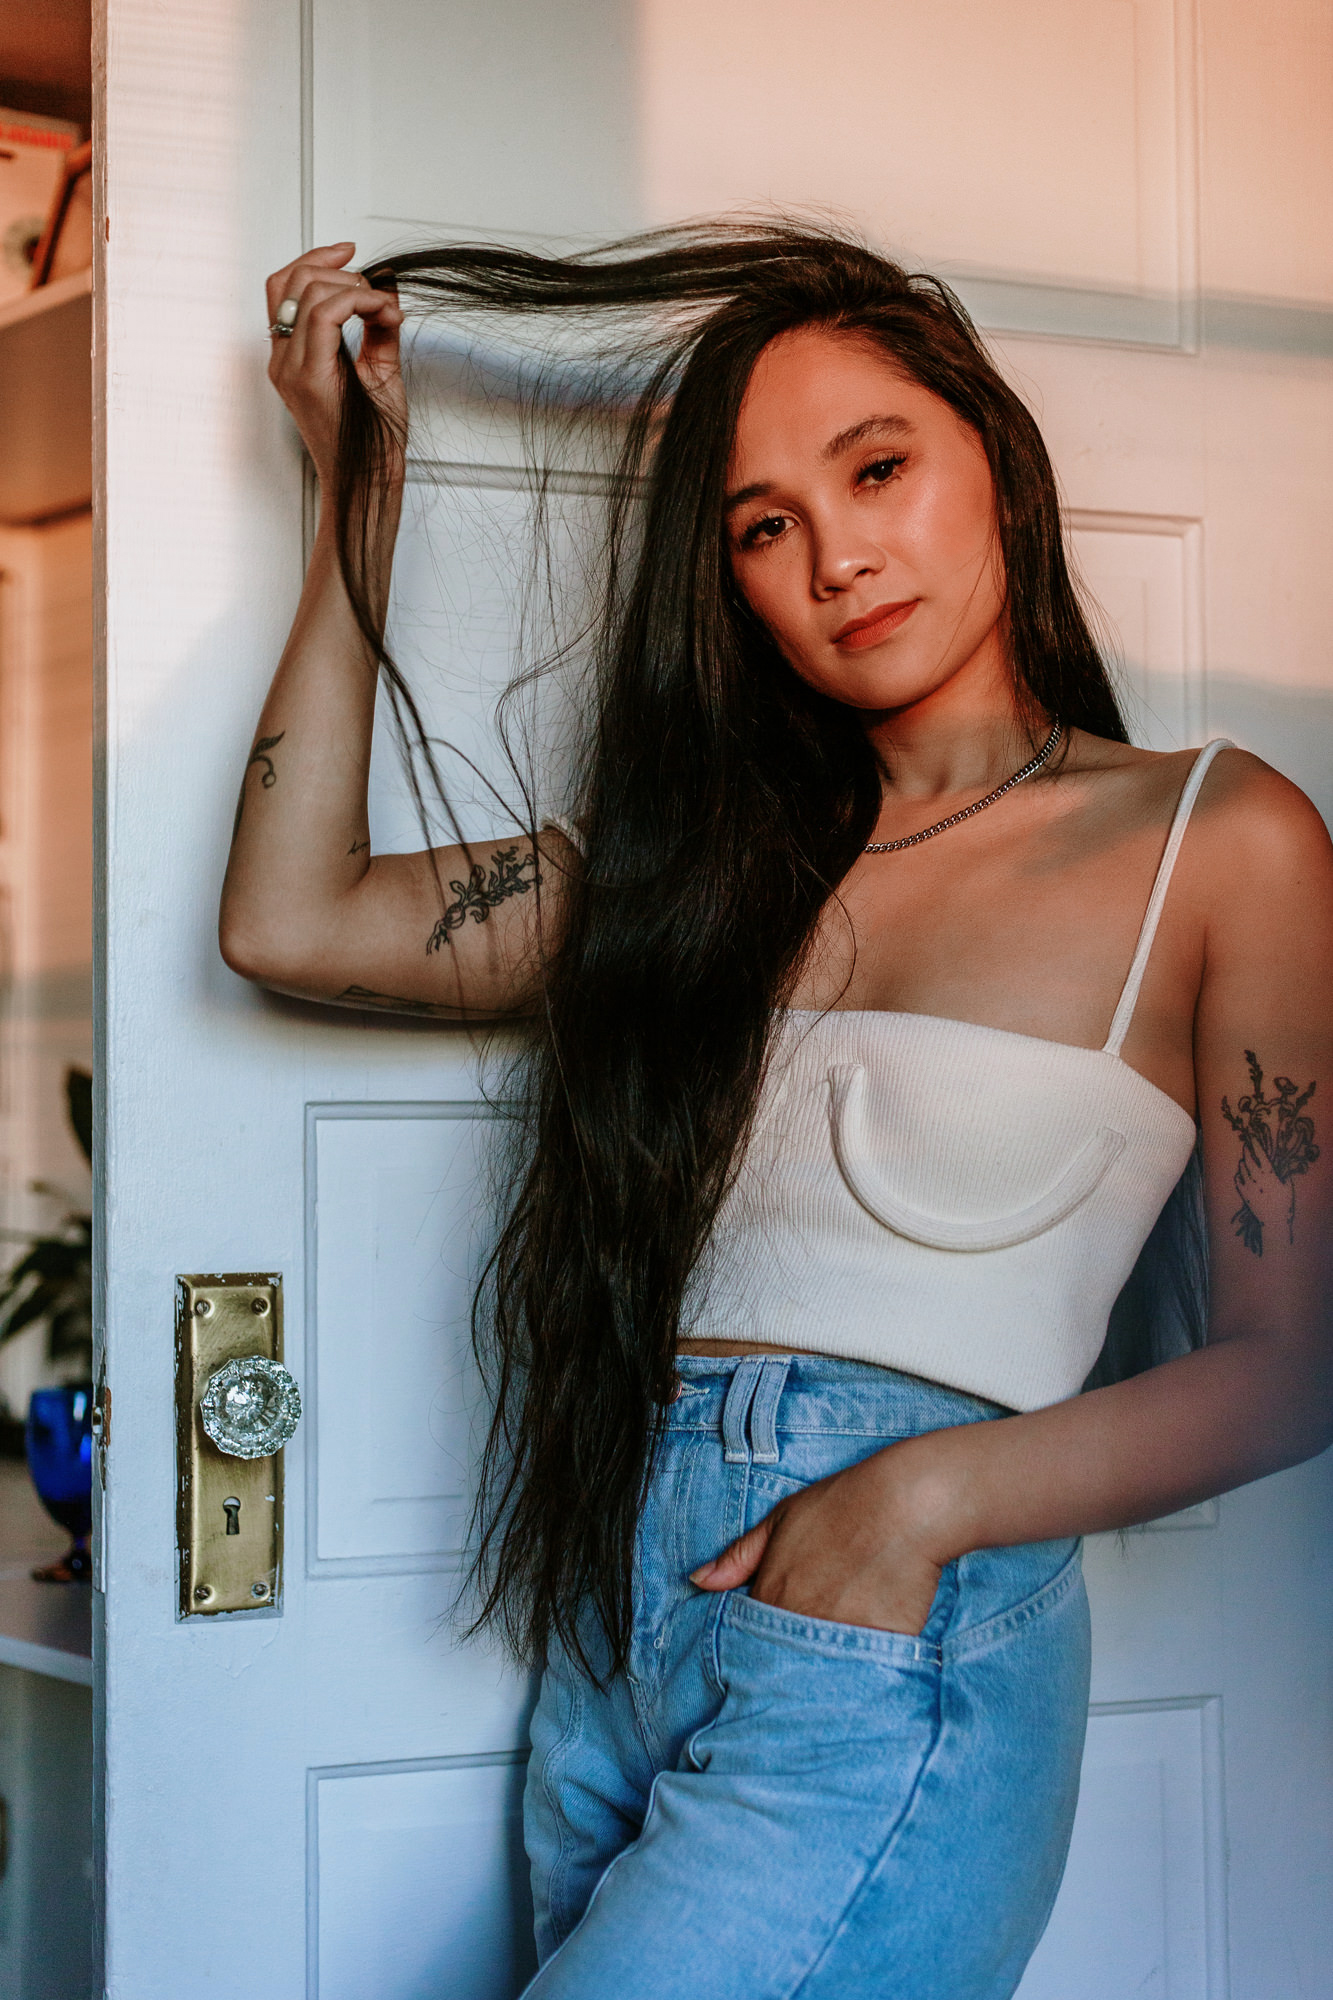 JillG-HaleyMcLainPhotography-4043.JPG